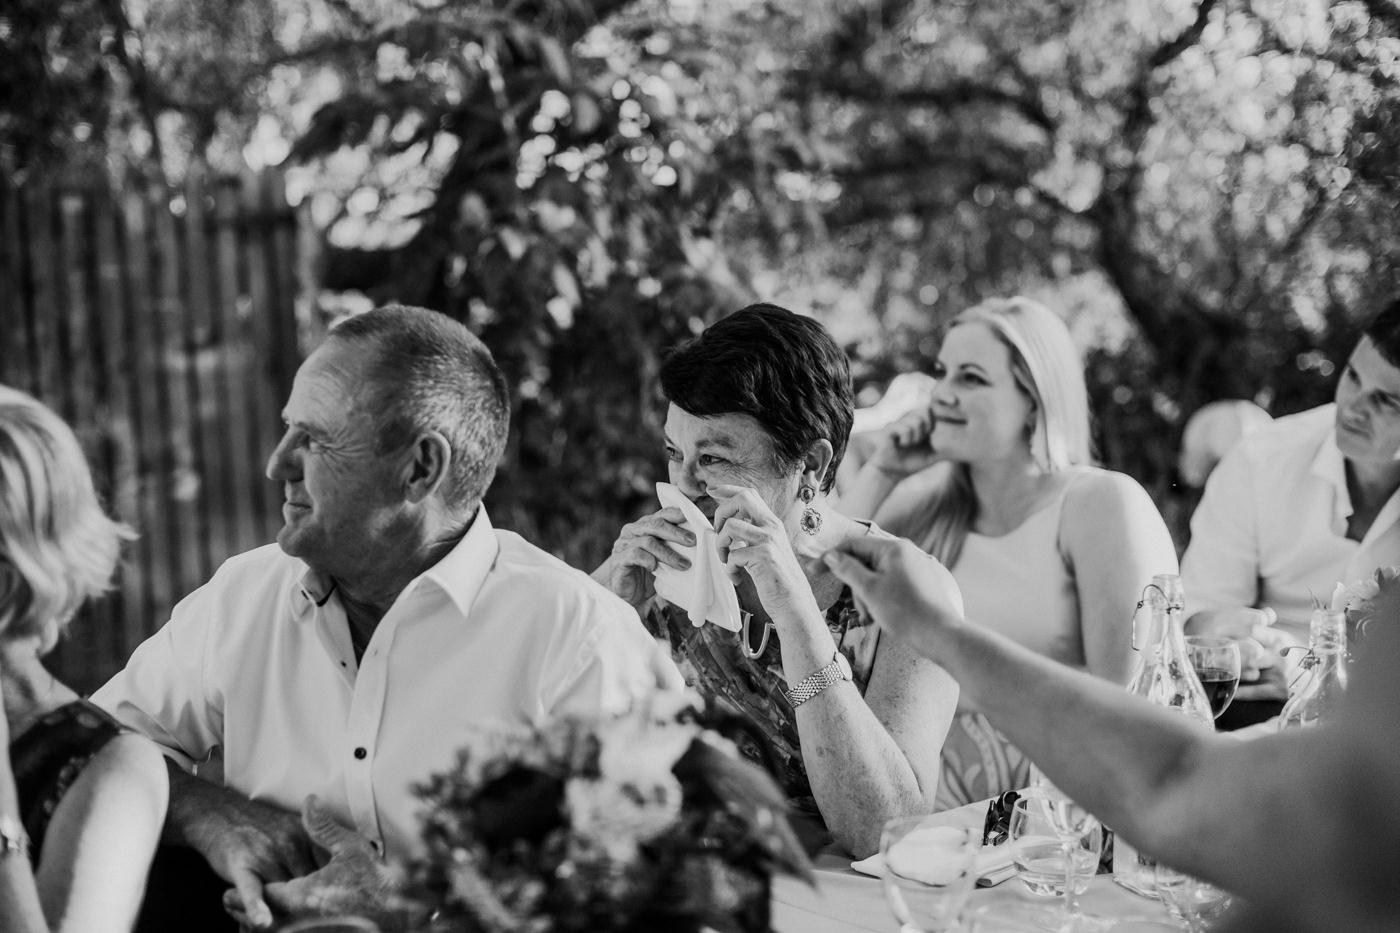 Anthony & Eliet - Wagga Wagga Wedding - Country NSW - Samantha Heather Photography-140.jpg